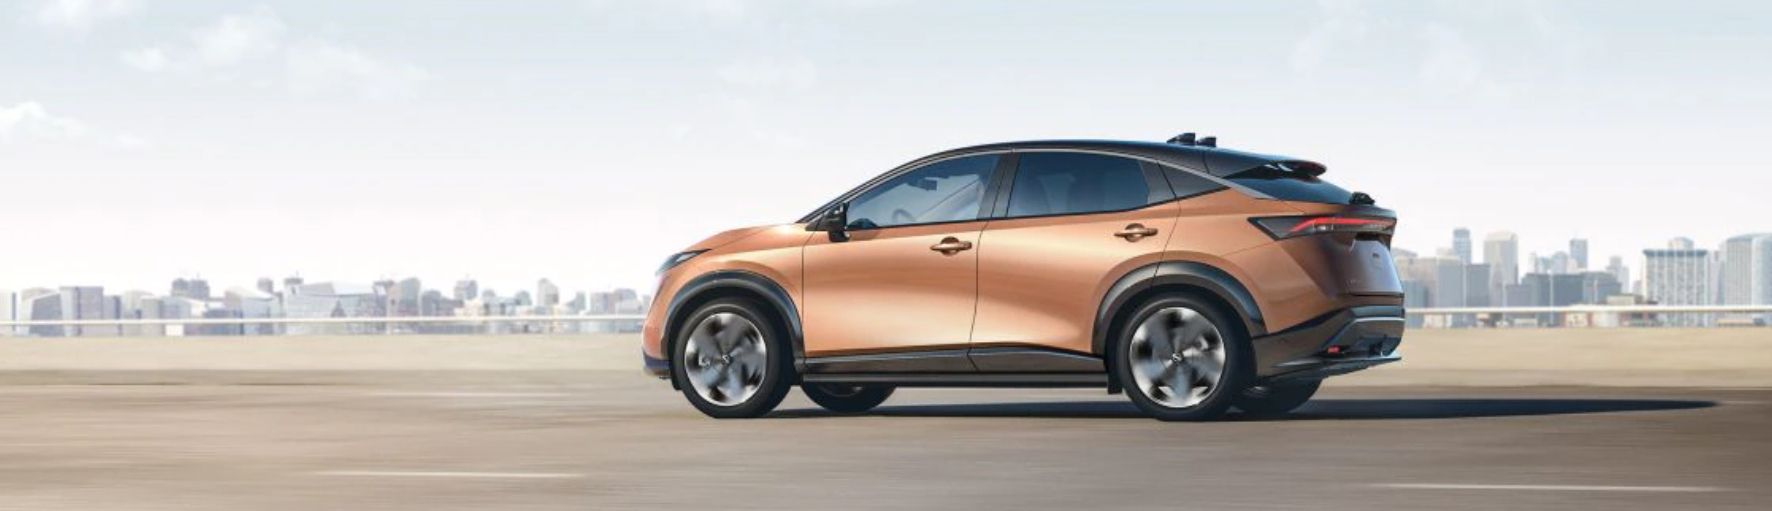 Nissan Ariya 2021 Autonomie et recharge